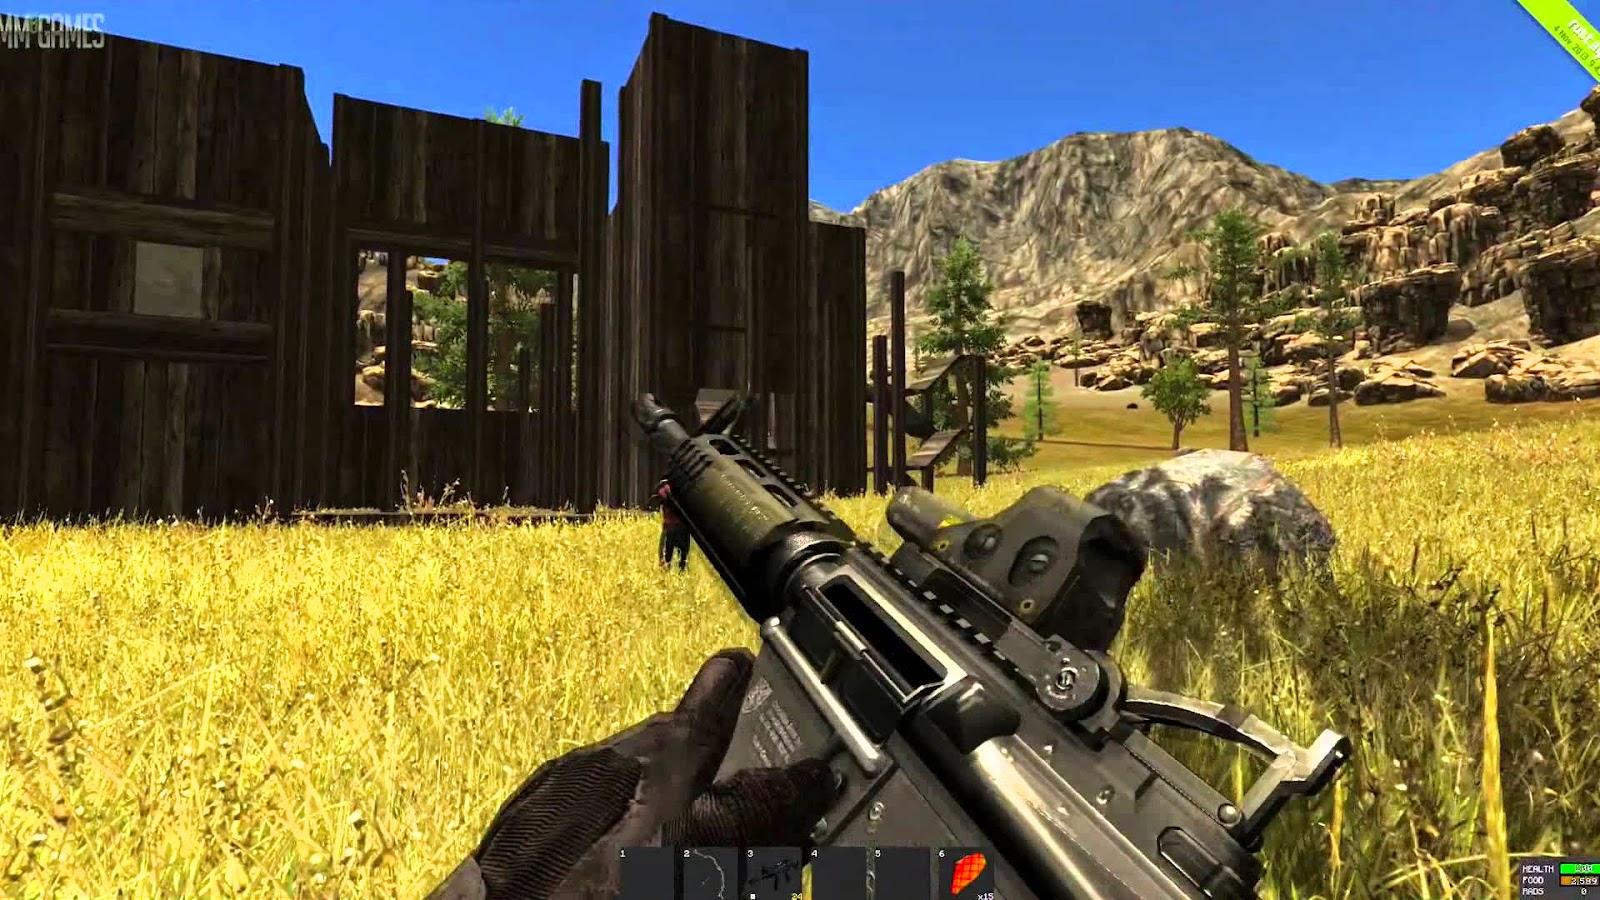 Rust V.1179 No-Steam juego para pc game free download version pirata dlc repack dvd iso